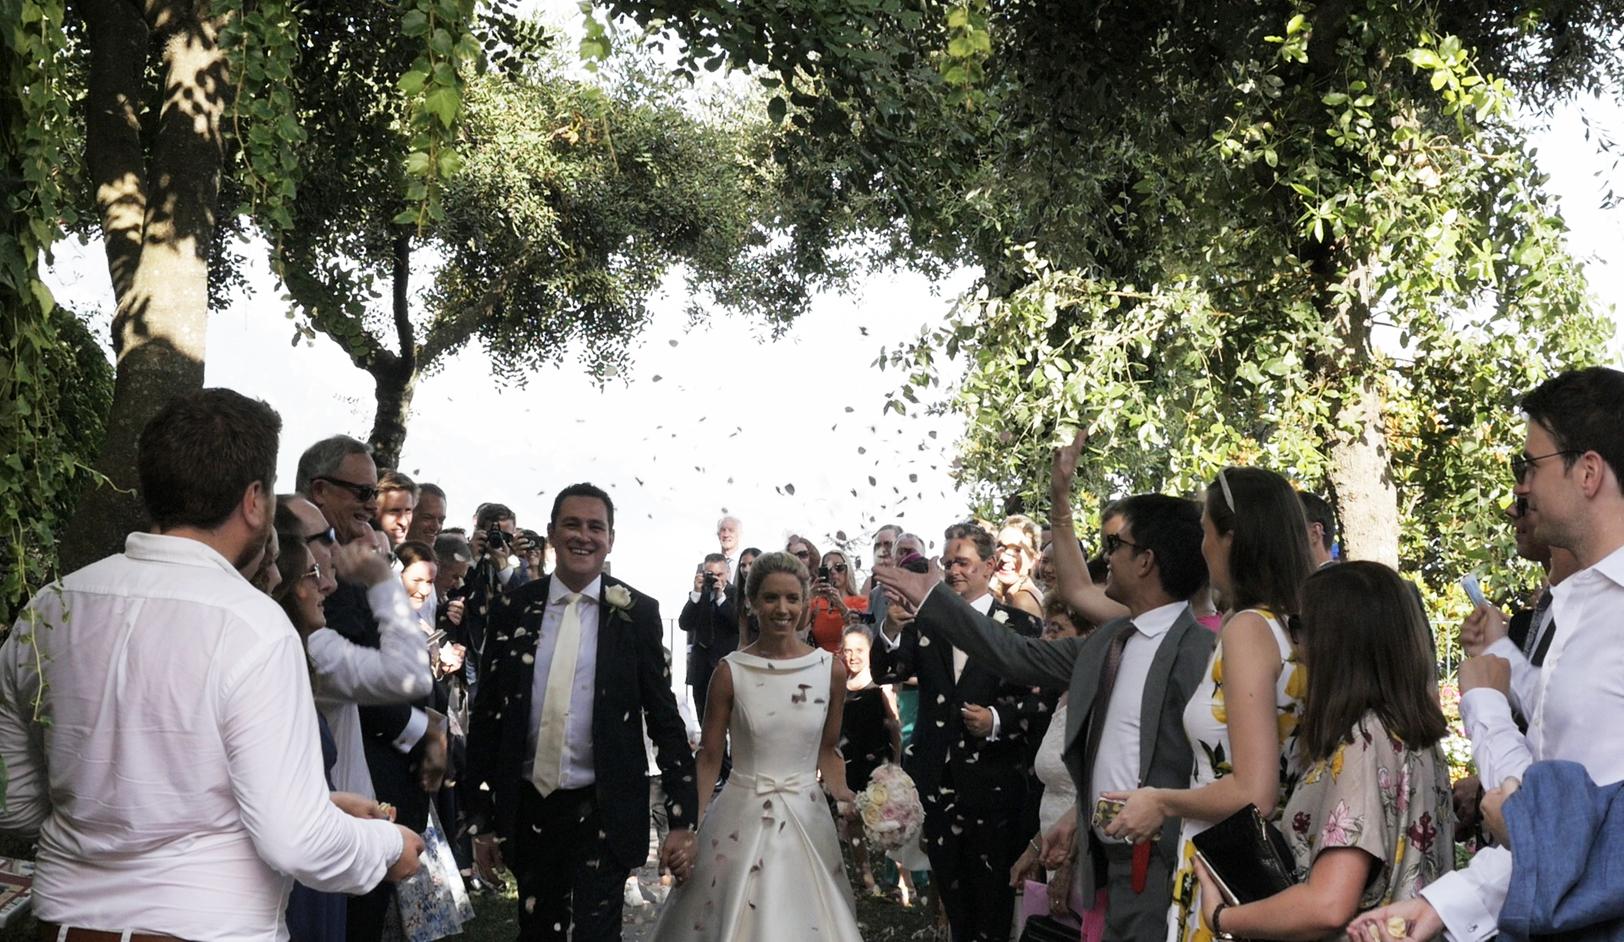 matrimonio-a-ravello-villa-cimbrone-villa-eva-amalfi-italia.jpg